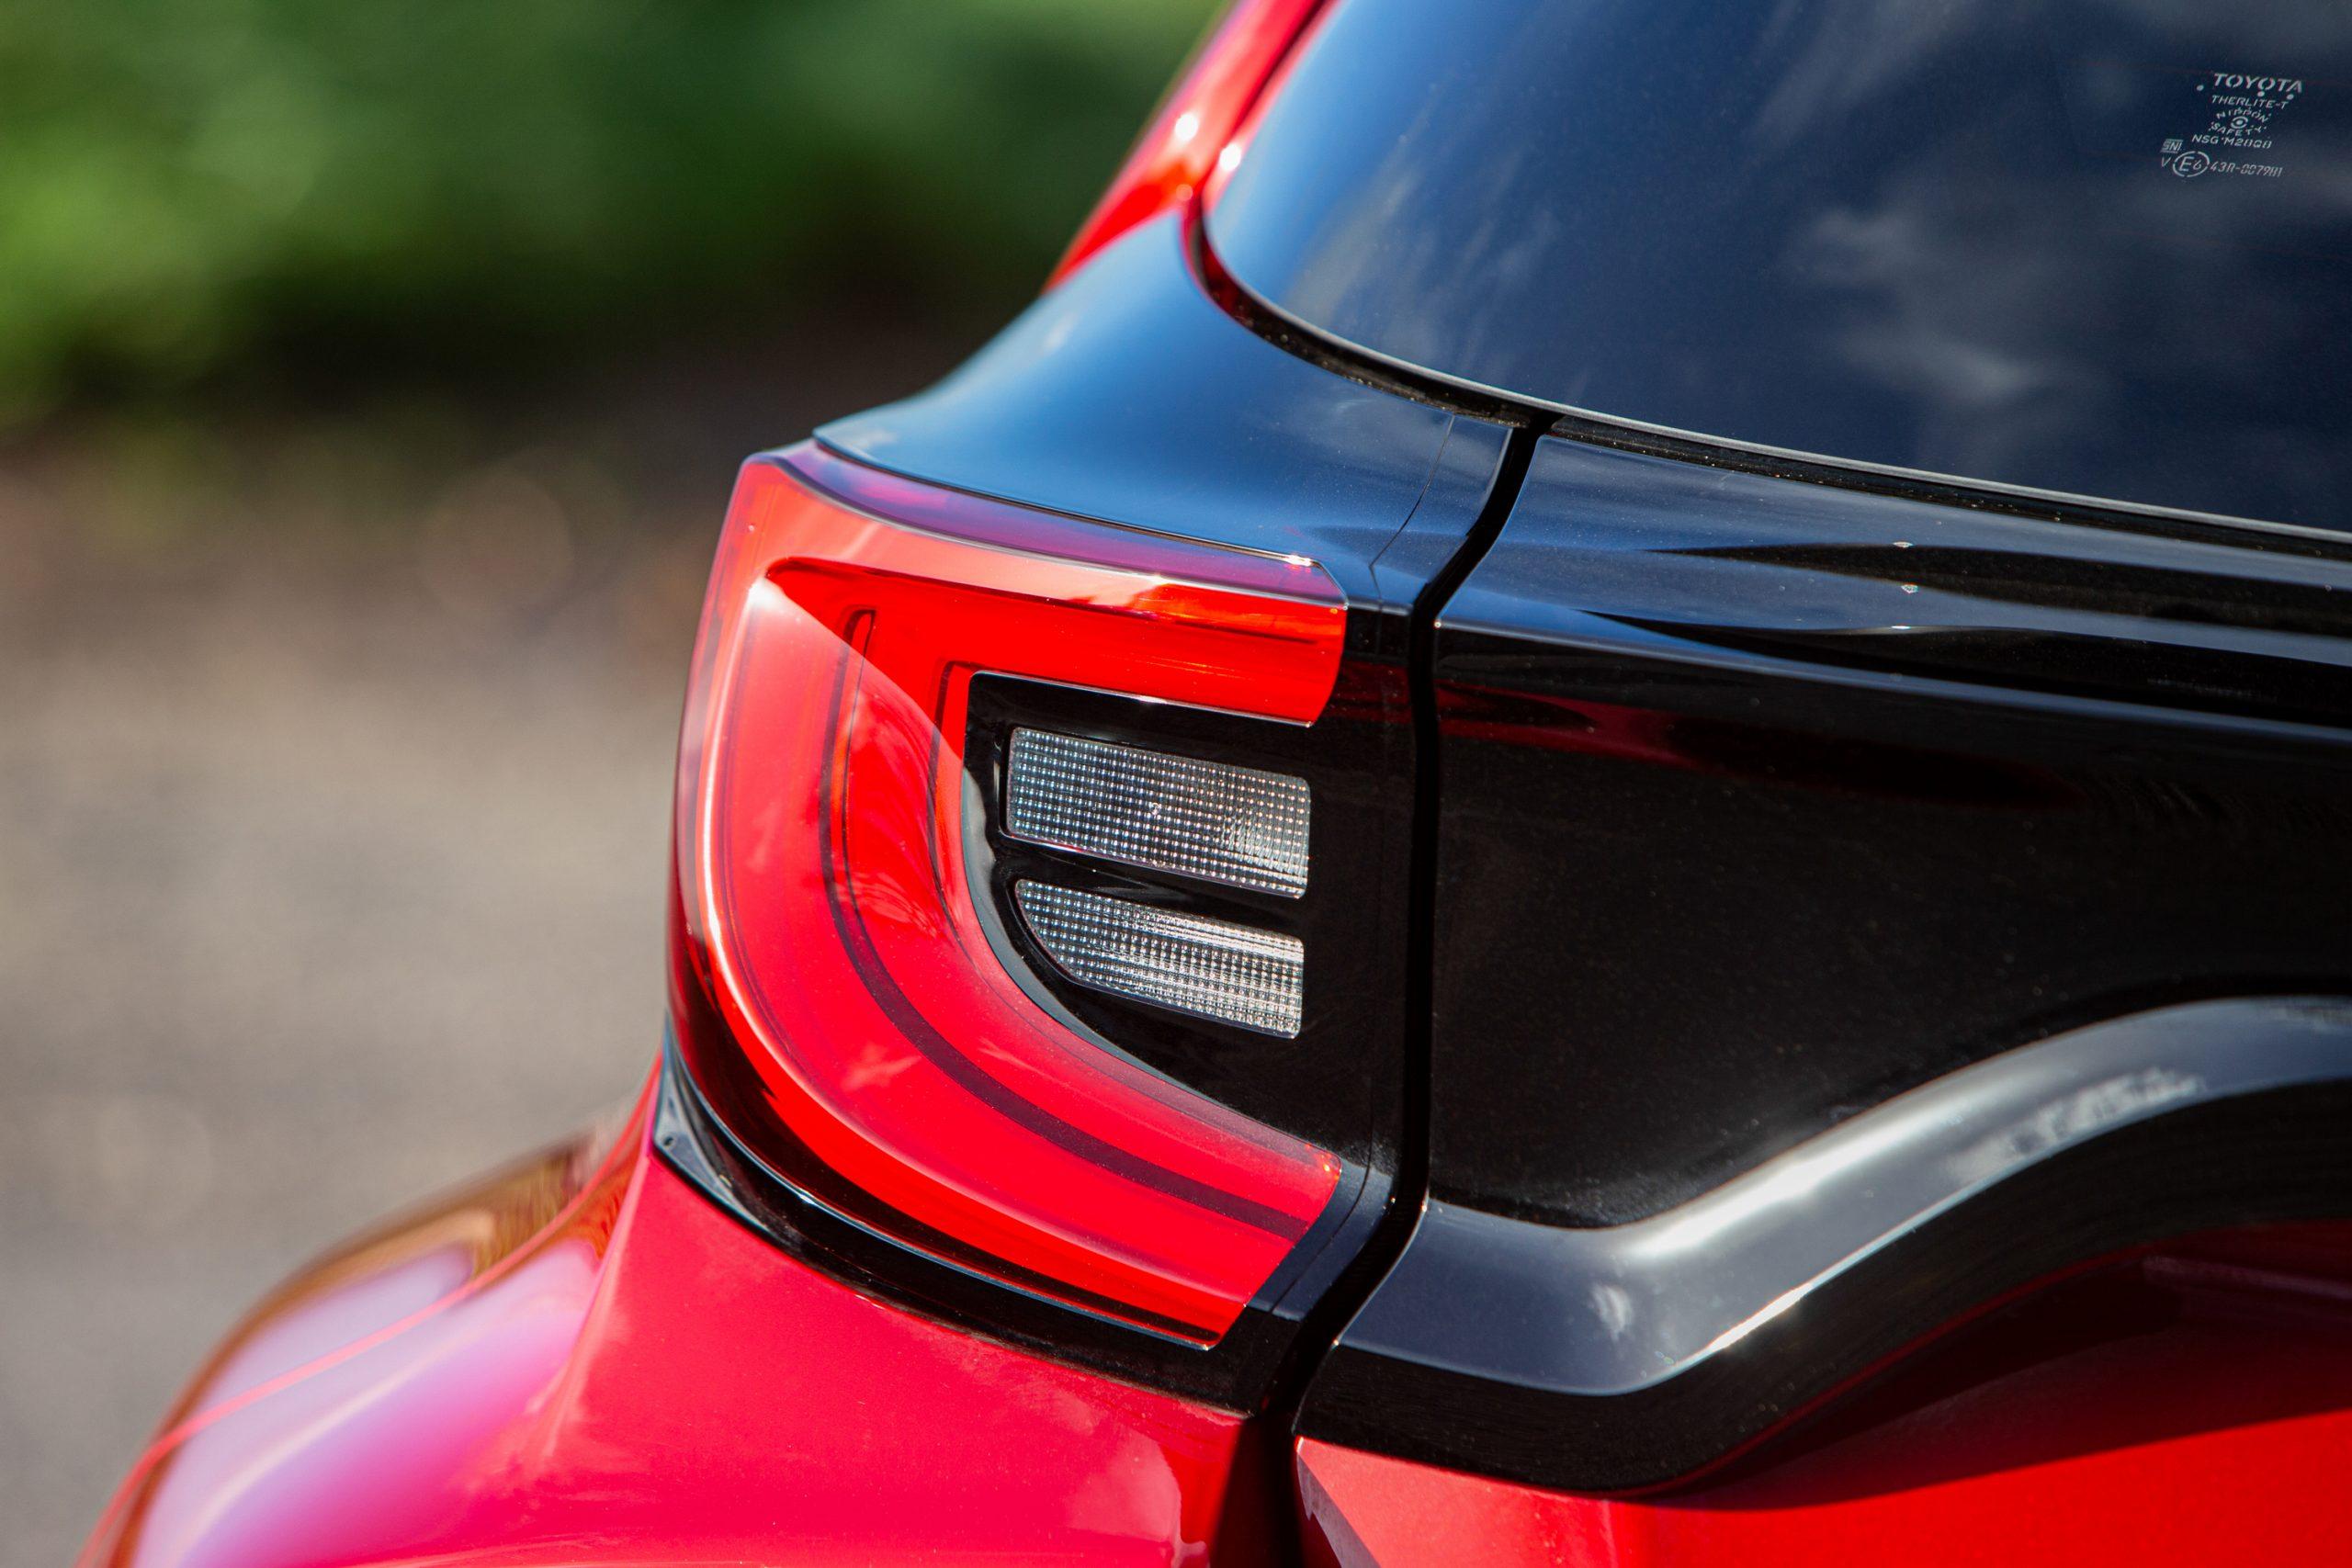 GR Toyota Yaris taillight detail